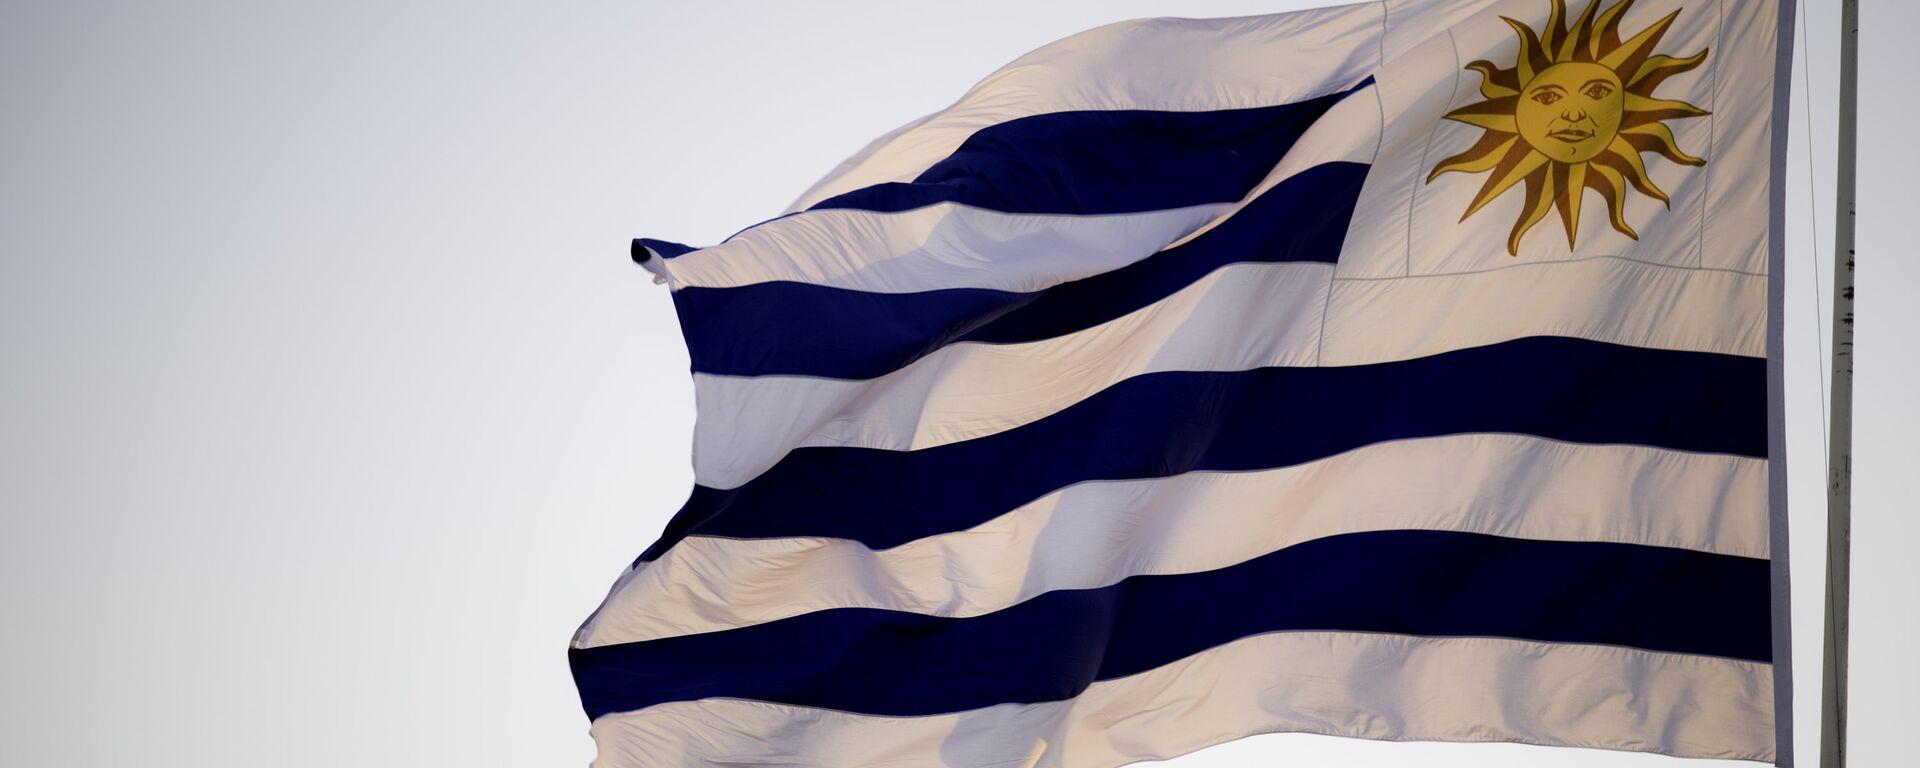 Bandera de Uruguay - Sputnik Mundo, 1920, 09.02.2021